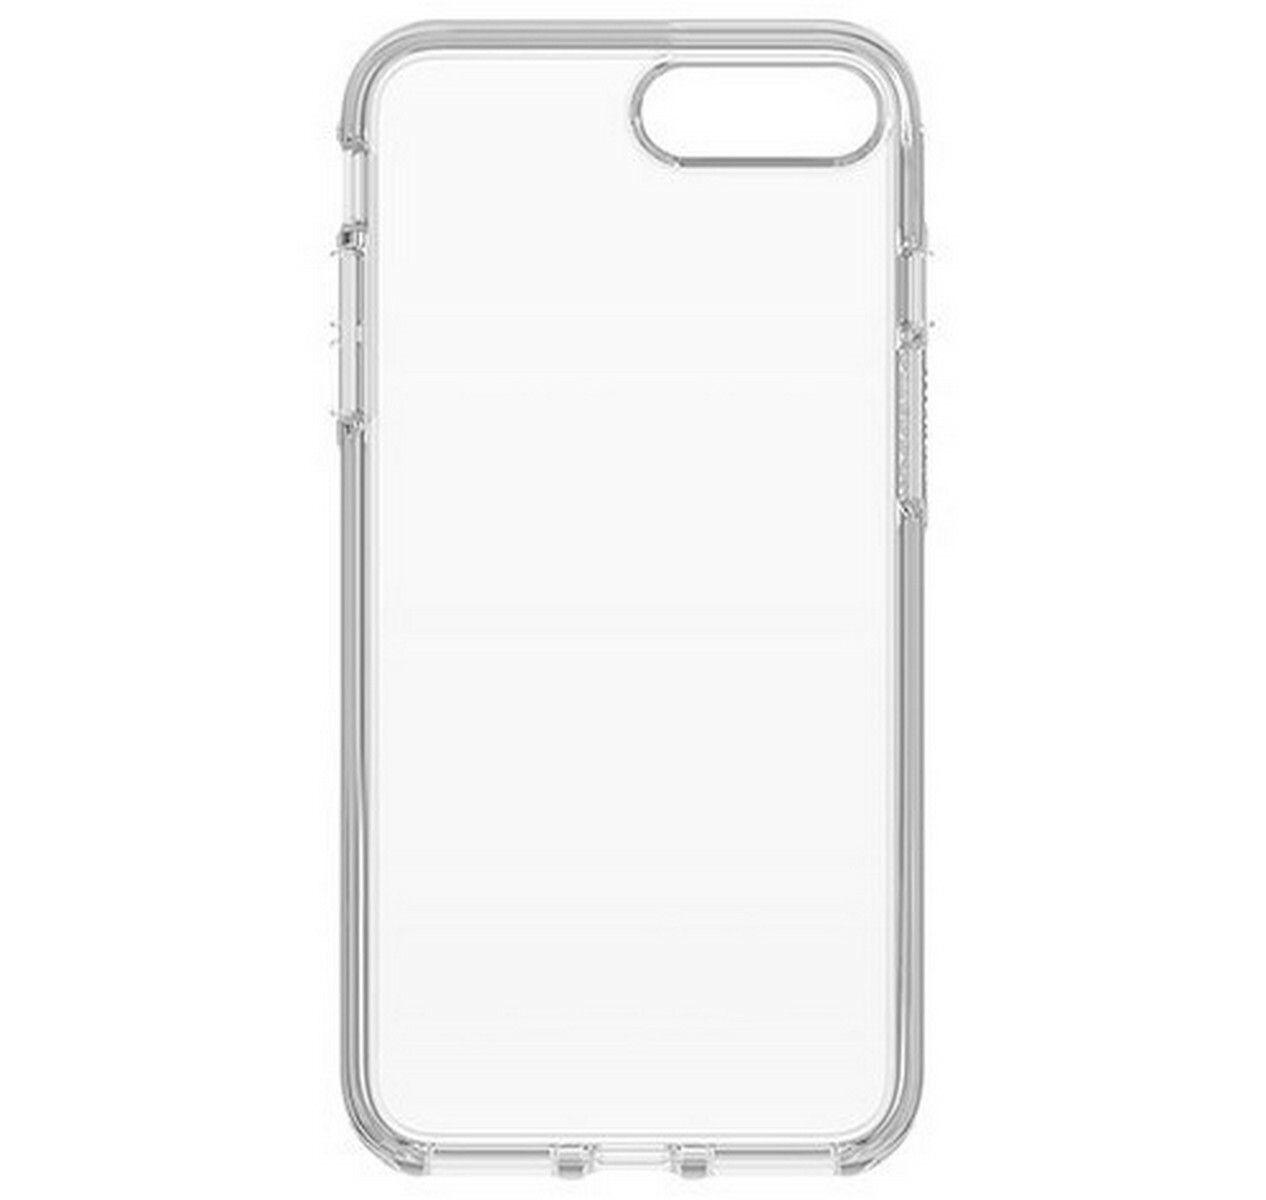 Silikonový kryt pro Apple iPhone 7 plus, transparentní SIXTOL